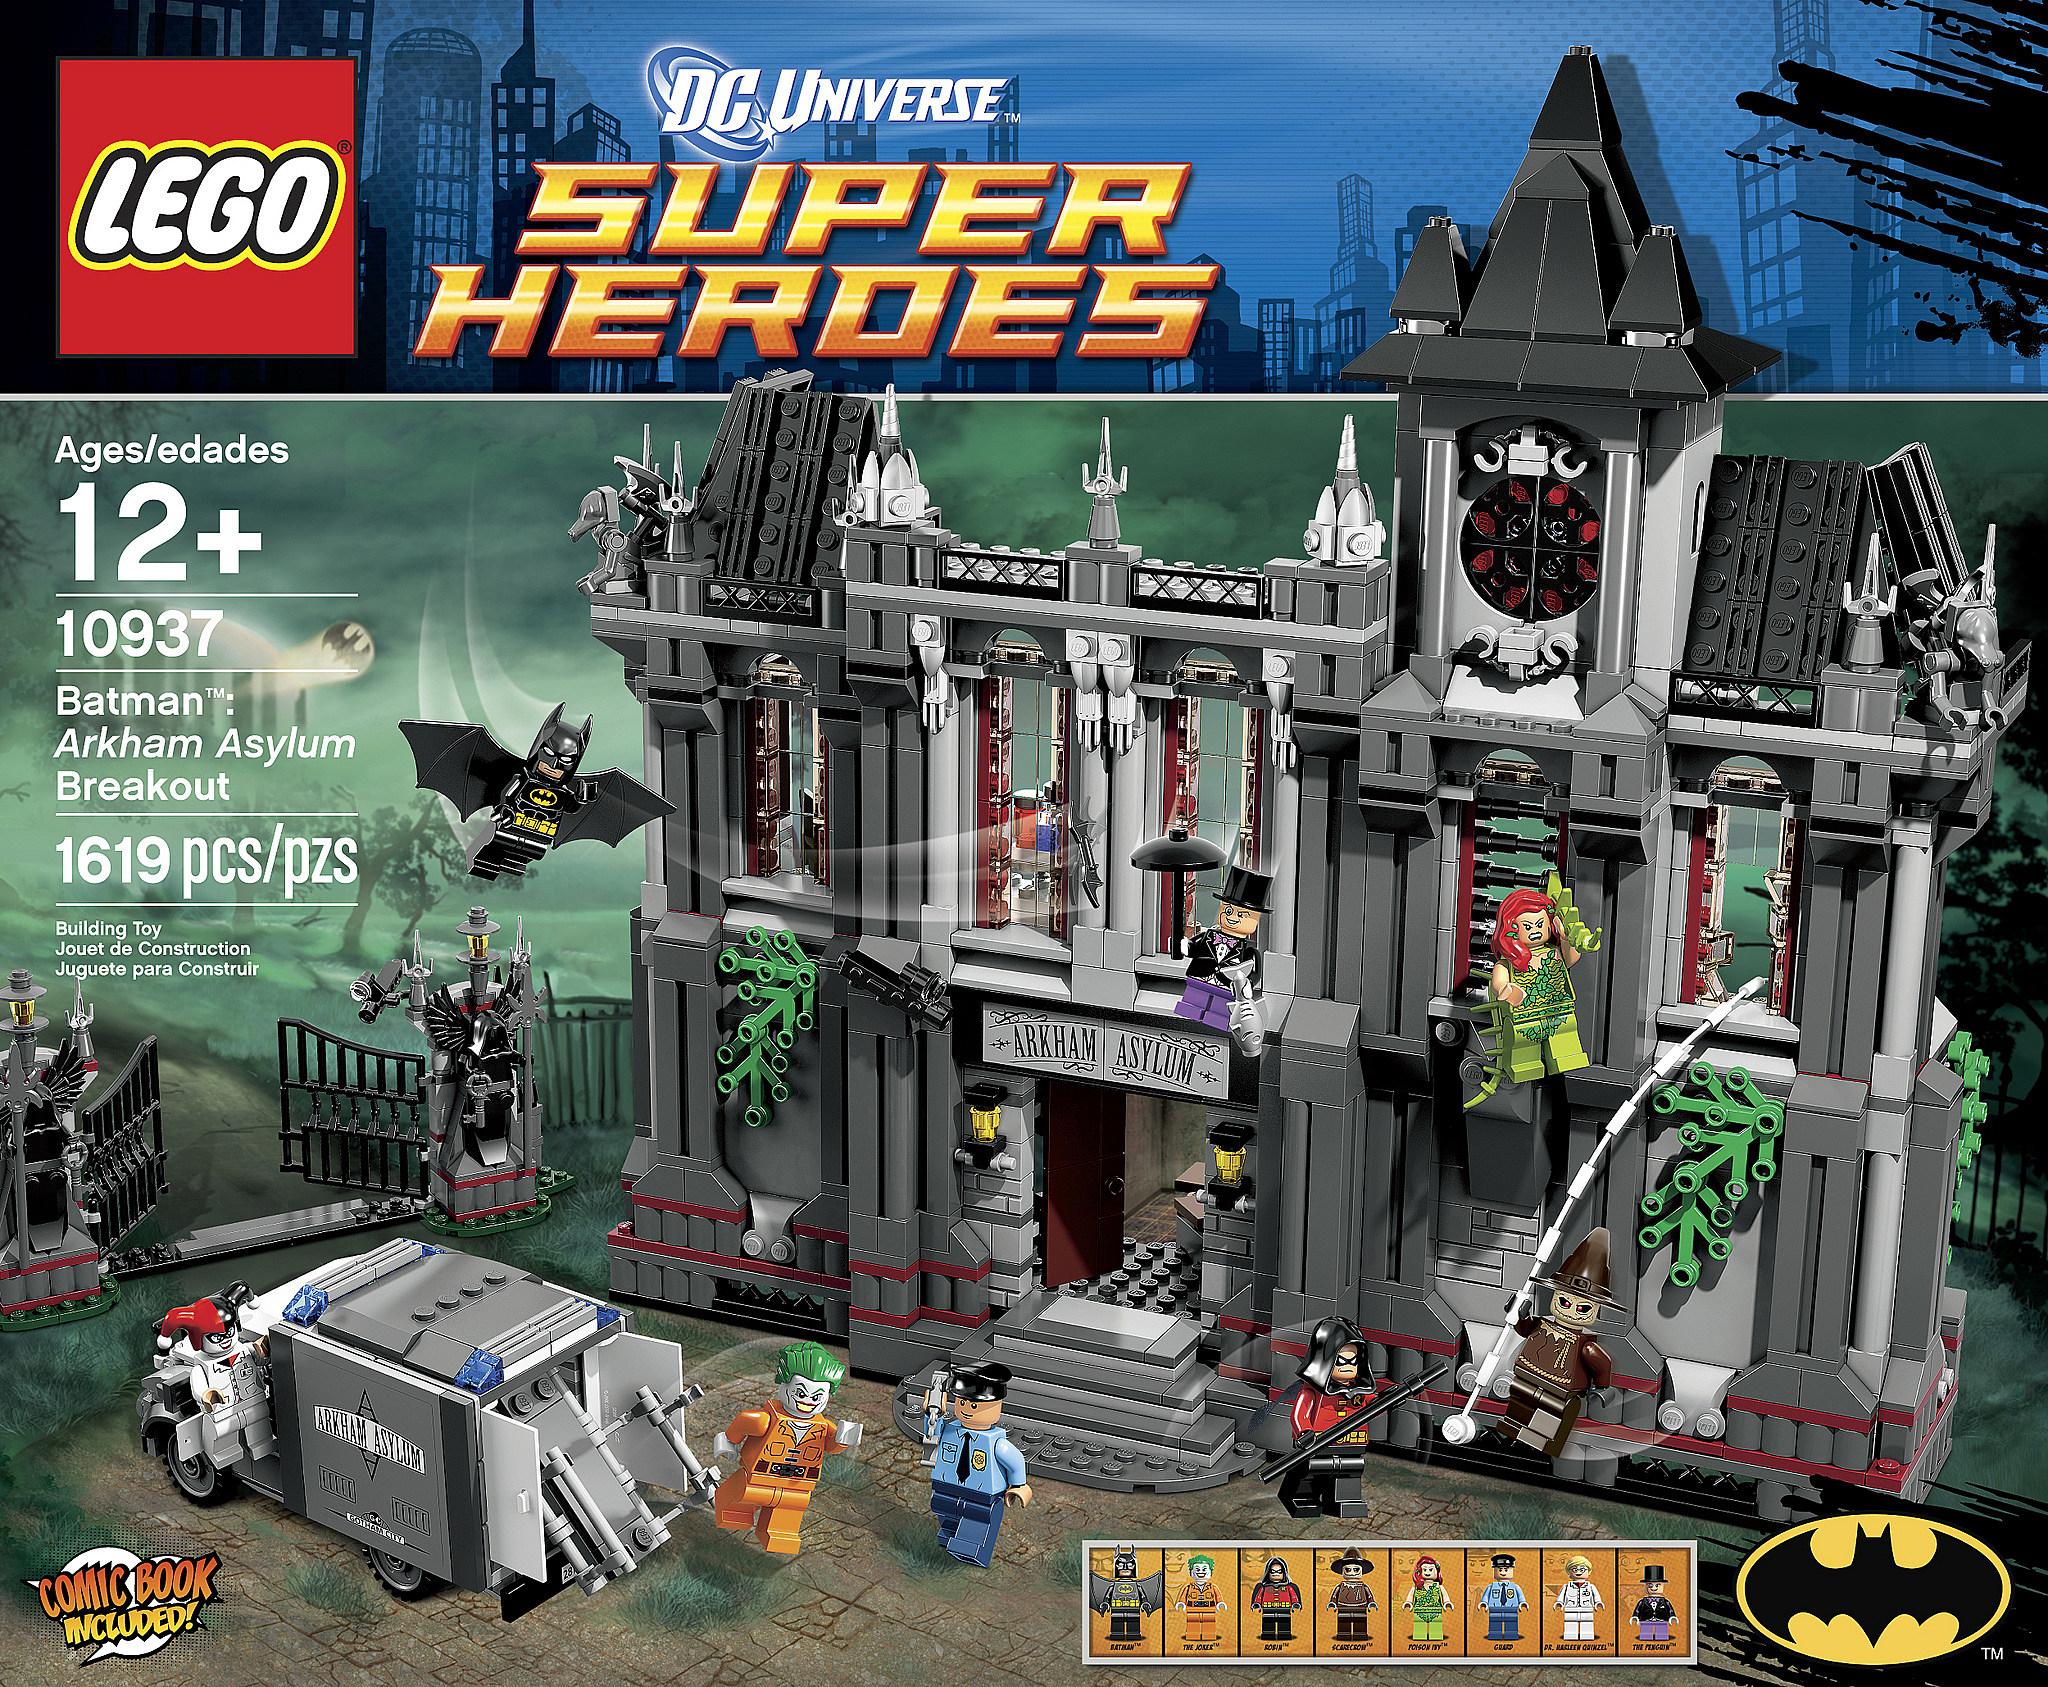 Massive New Lego Arkham Asylum Set Announced